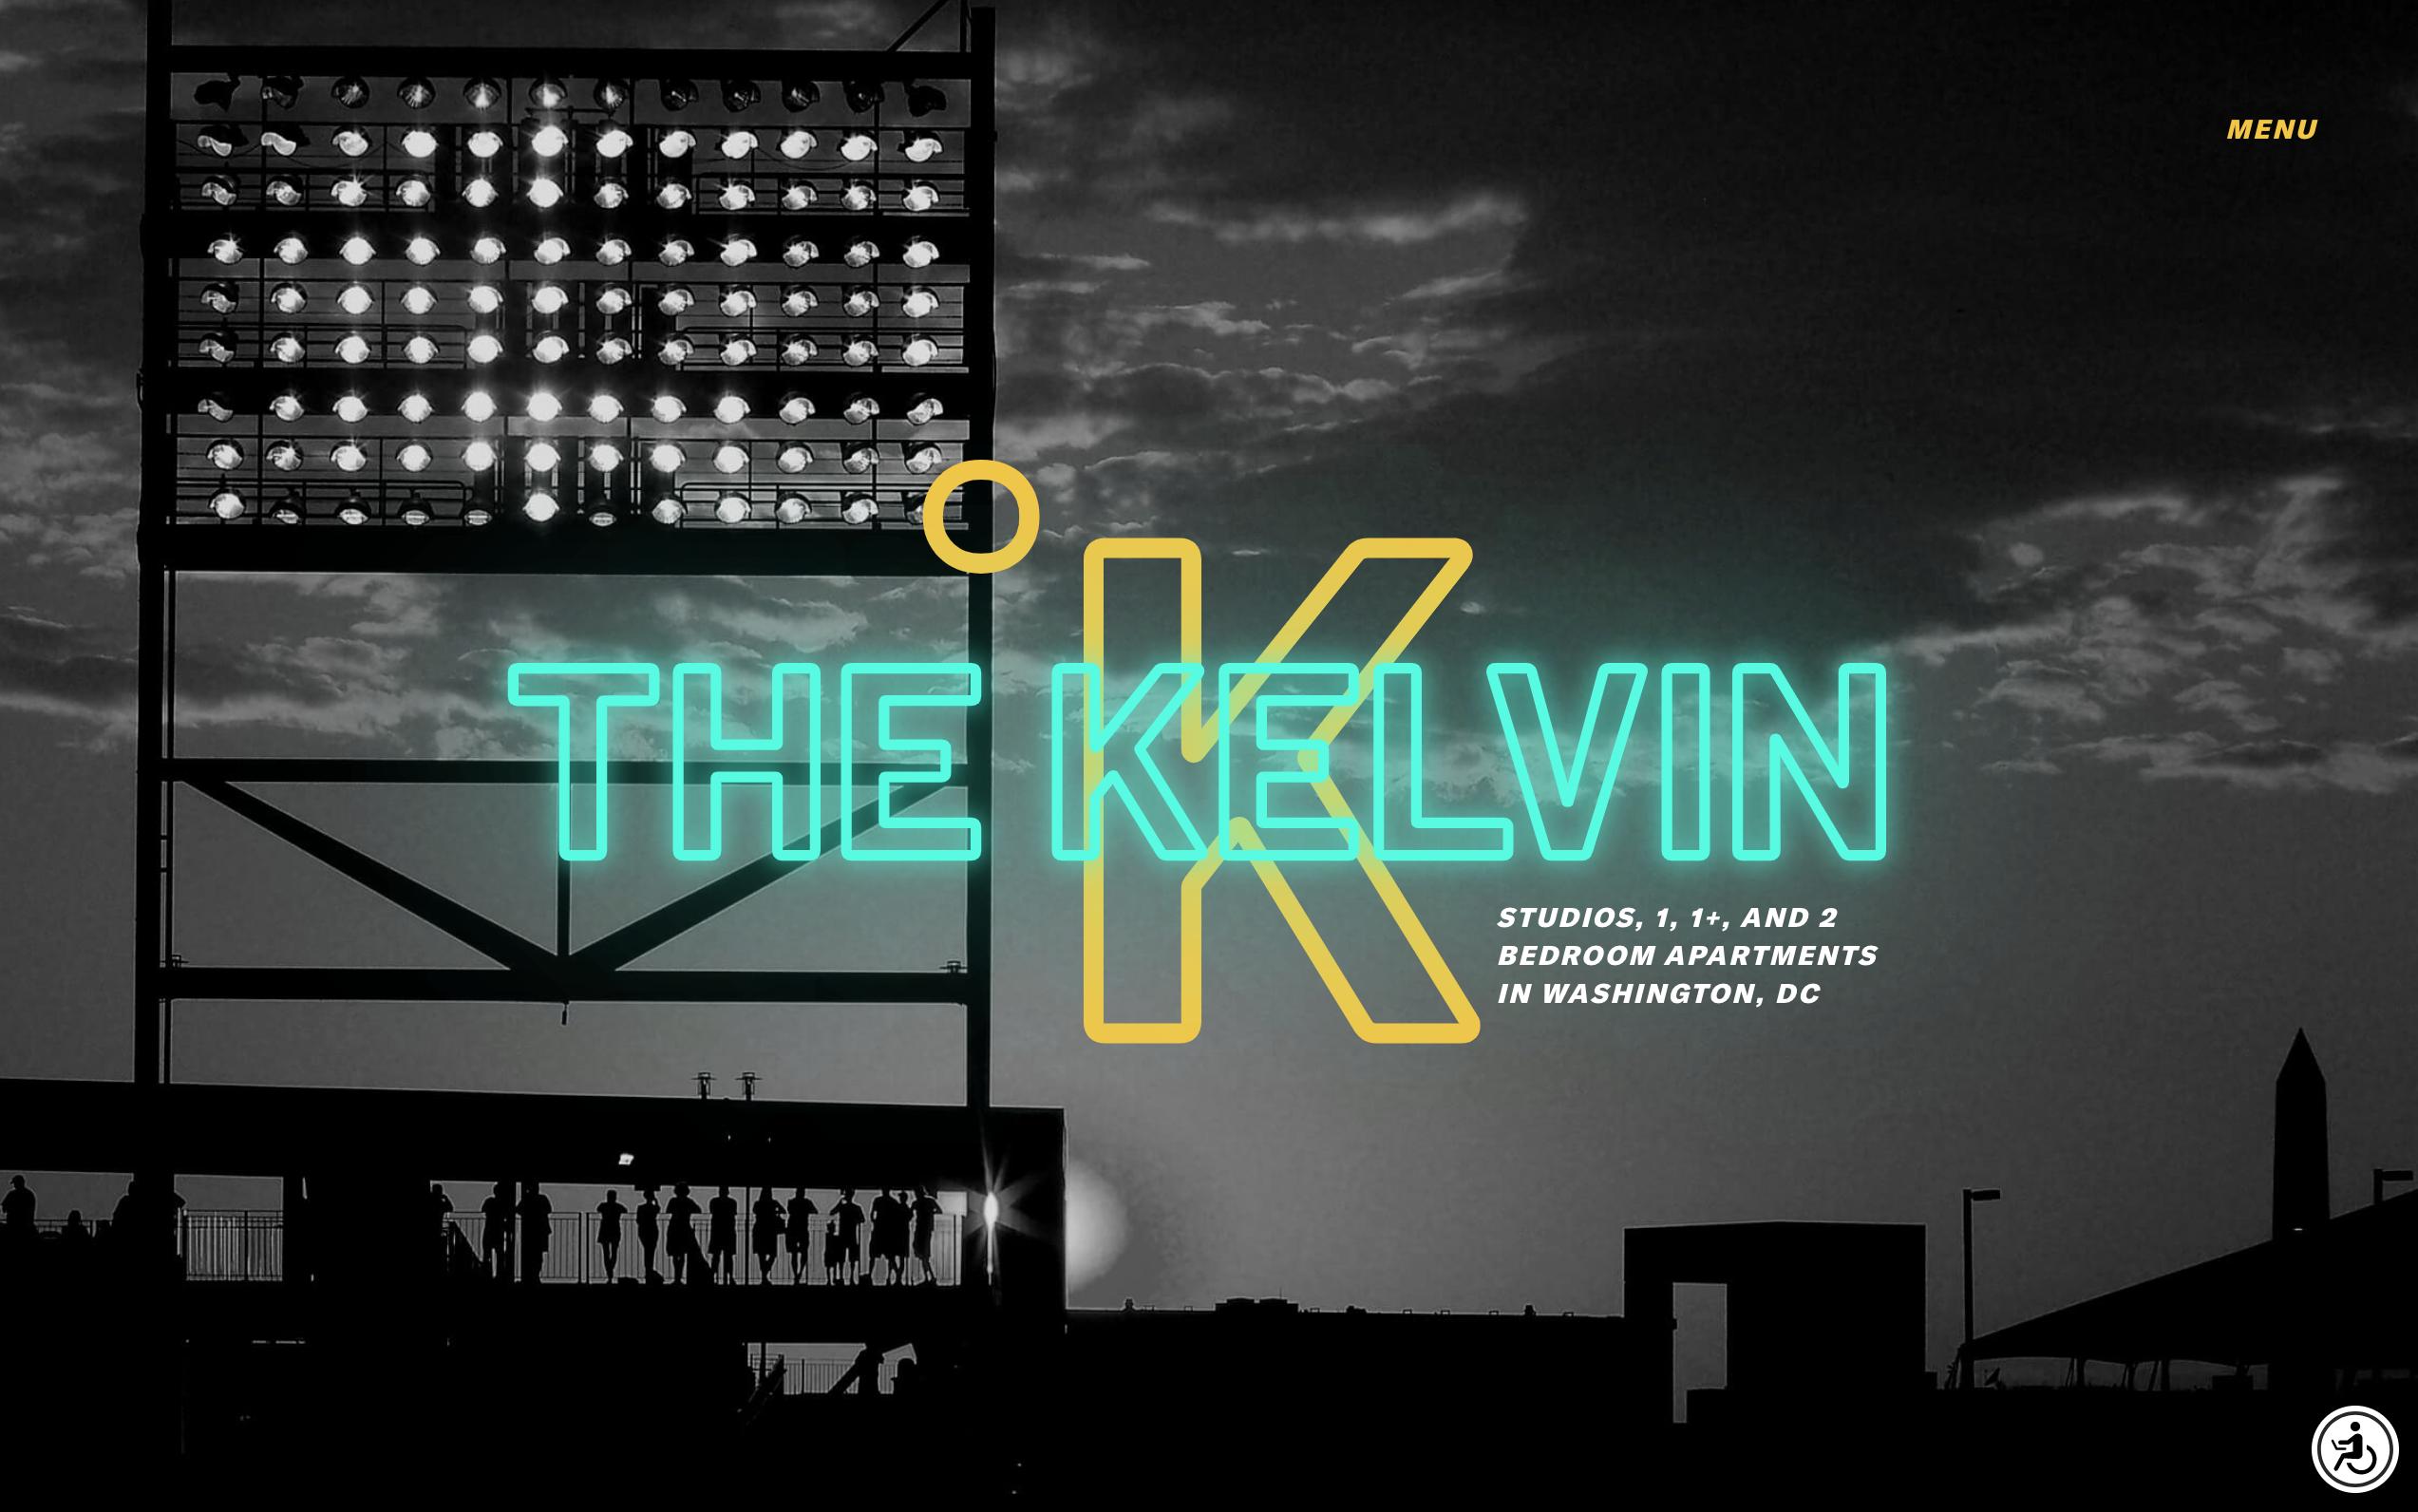 The Kelvin image